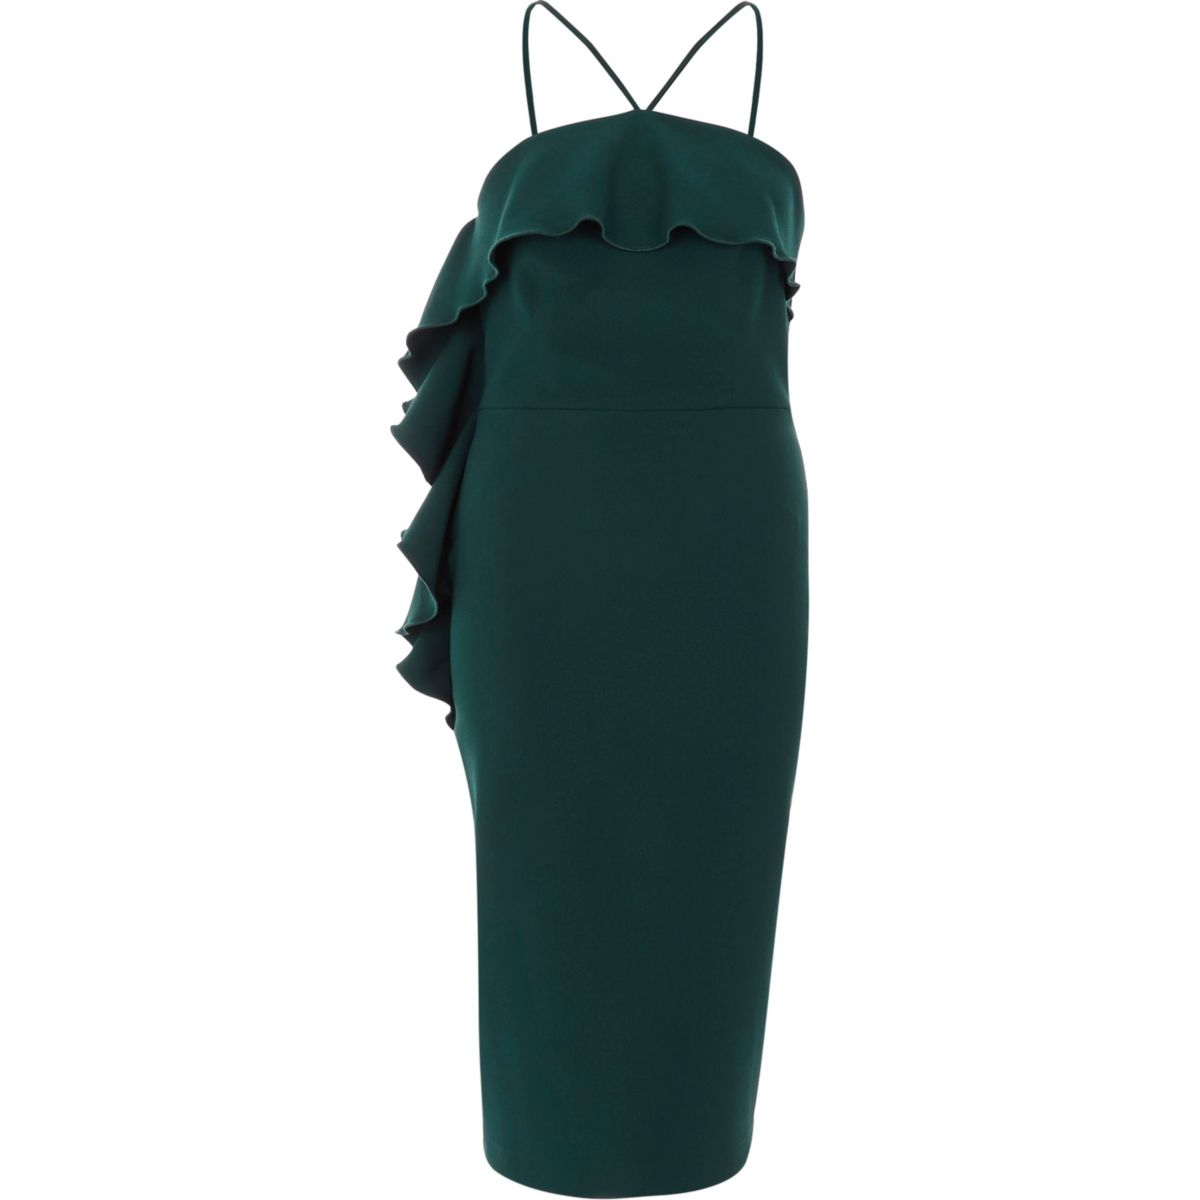 Green halter neck frill bodycon midi dress